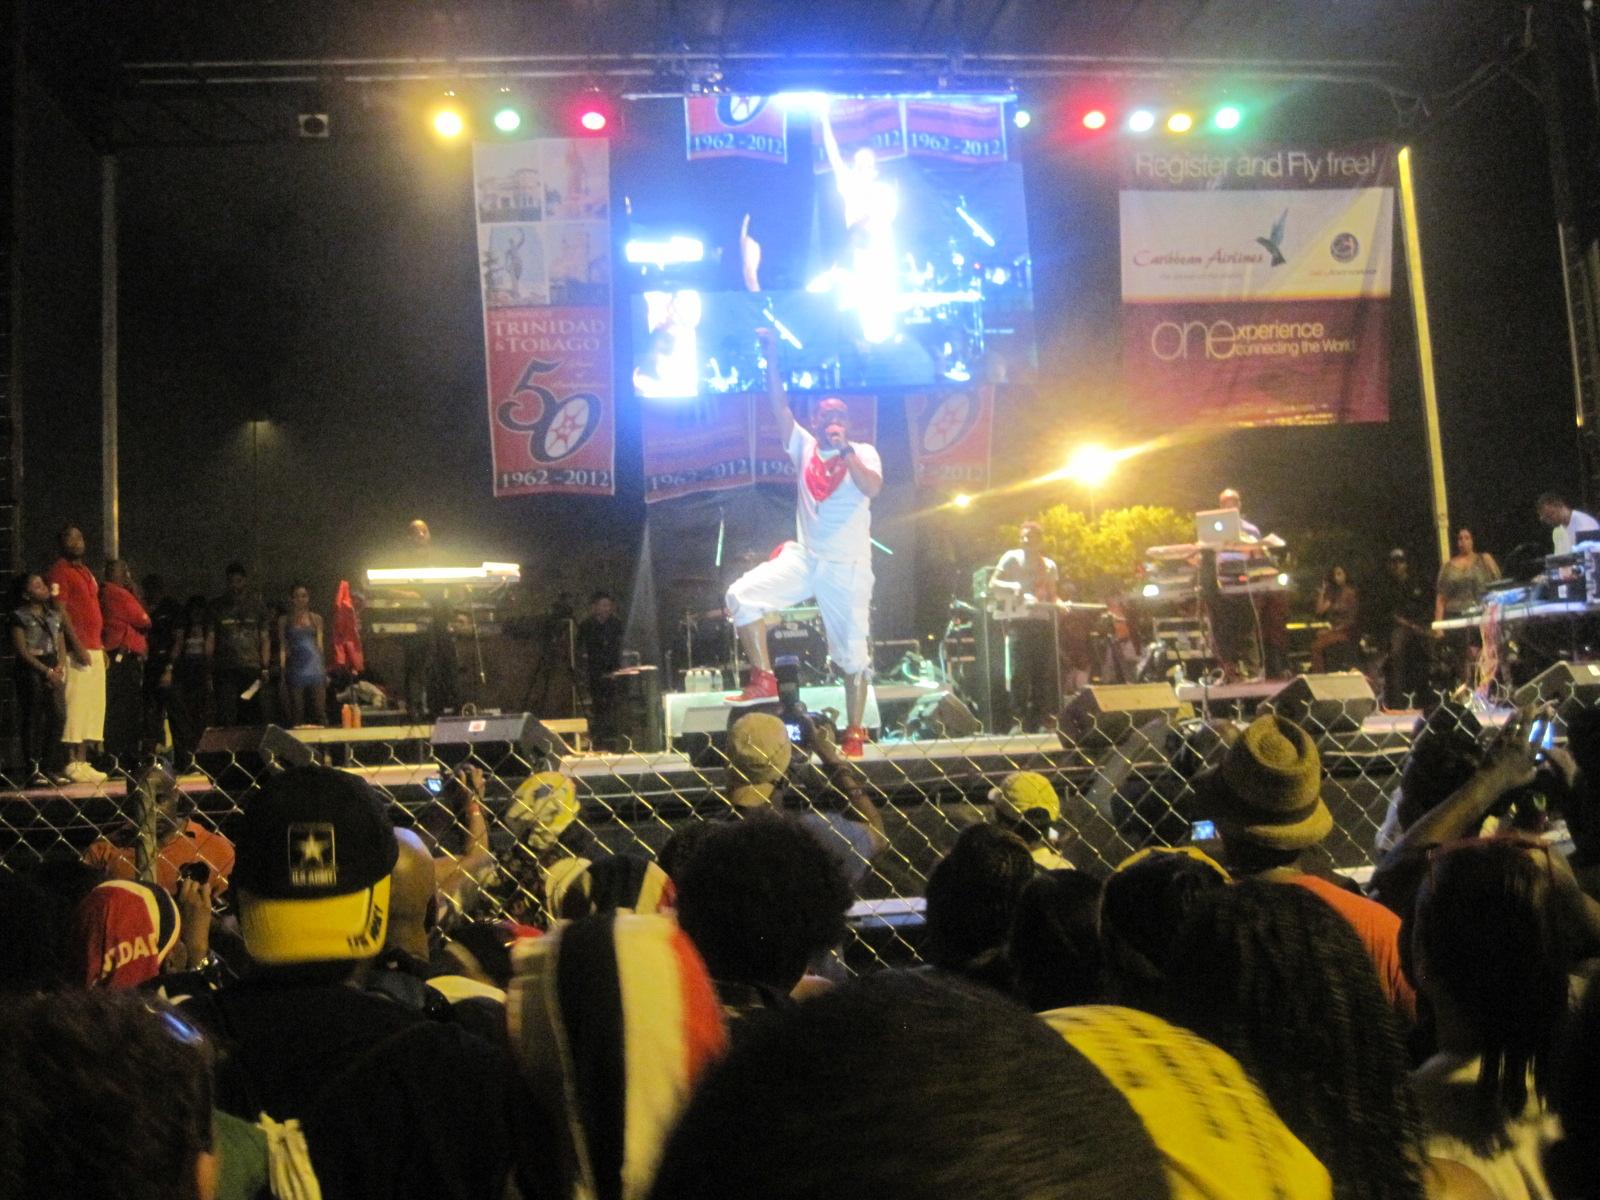 Machel Montano on stage at Sun Life Stadium